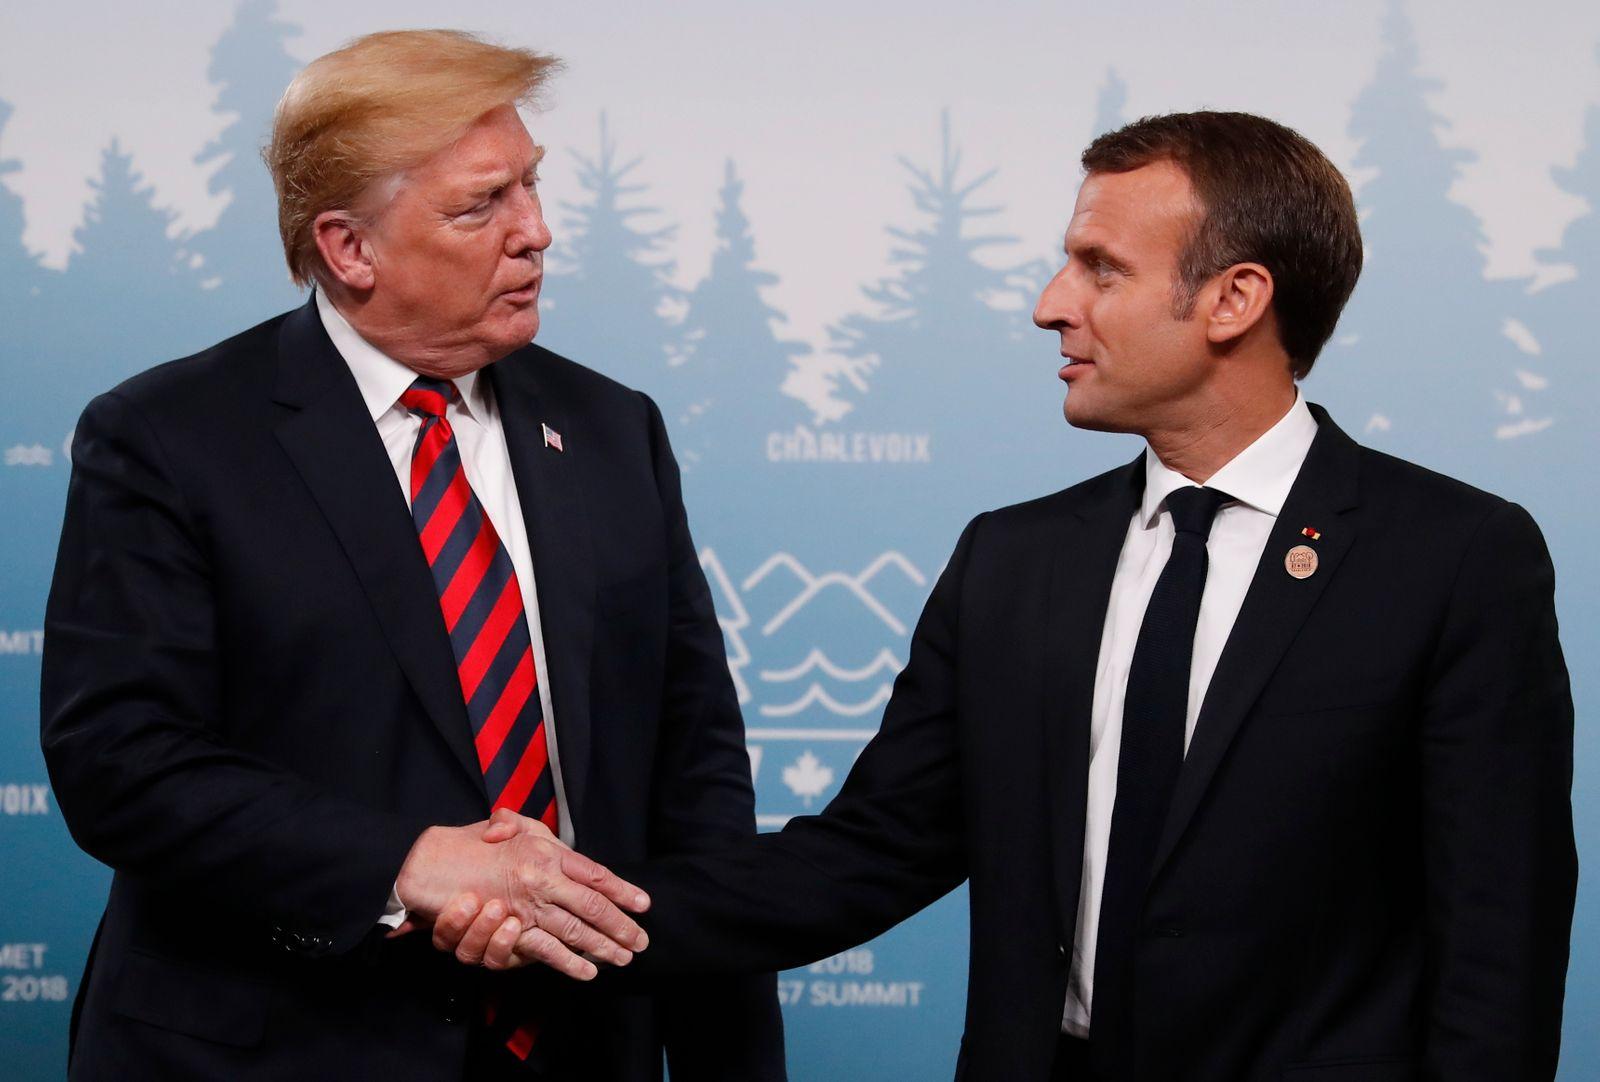 Reuters Trump Macron Hands G7 2